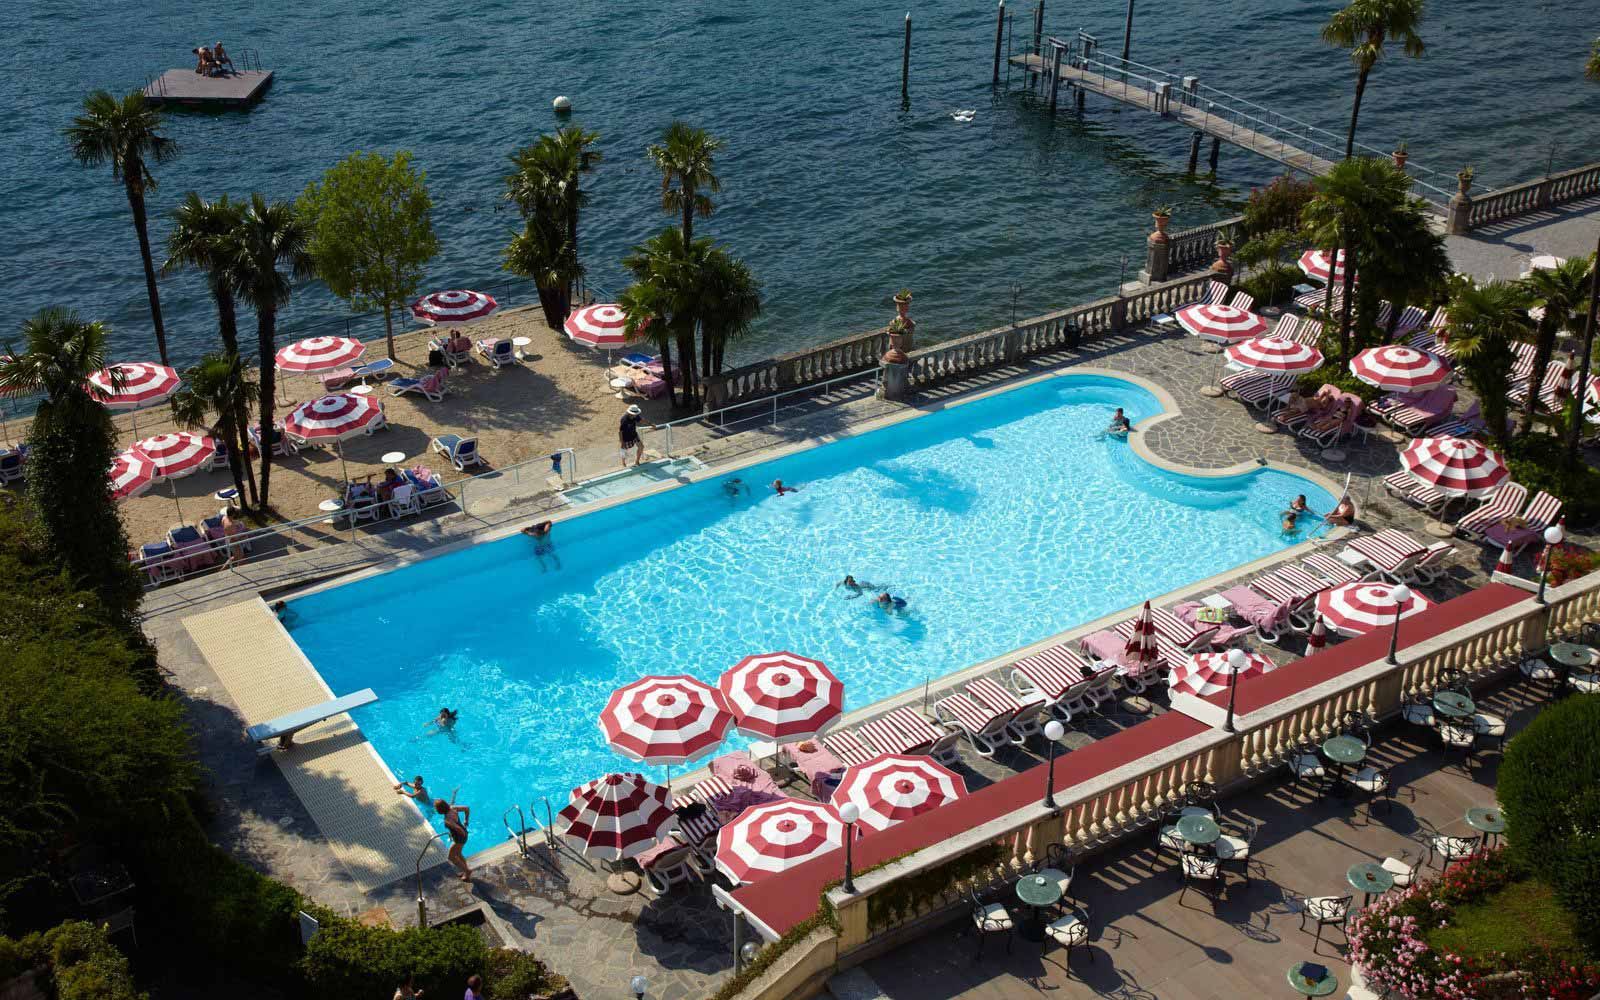 Swimming pool overlooking Lake Como at Grand Hotel Villa Serbelloni